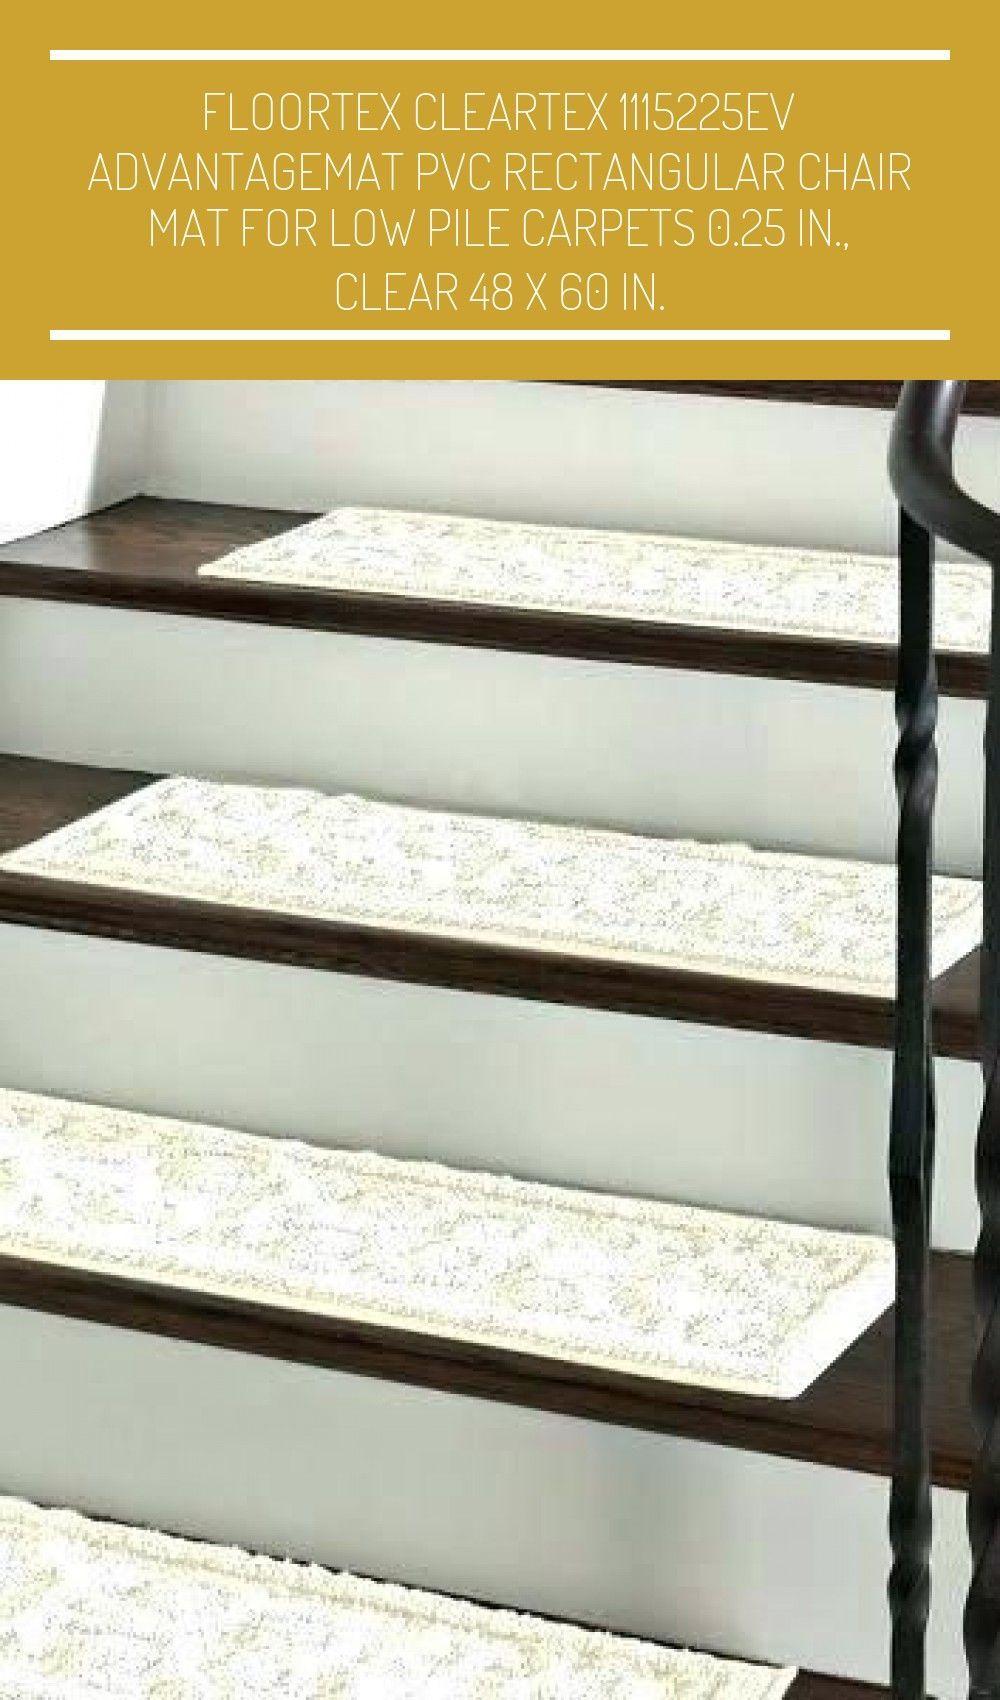 More Click Staircase Carpet Ideas Hallway Stair Carpet Ideas | Low Pile Carpet For Stairs | Laminate | Unusual | Looped | Antelope | Bedroom